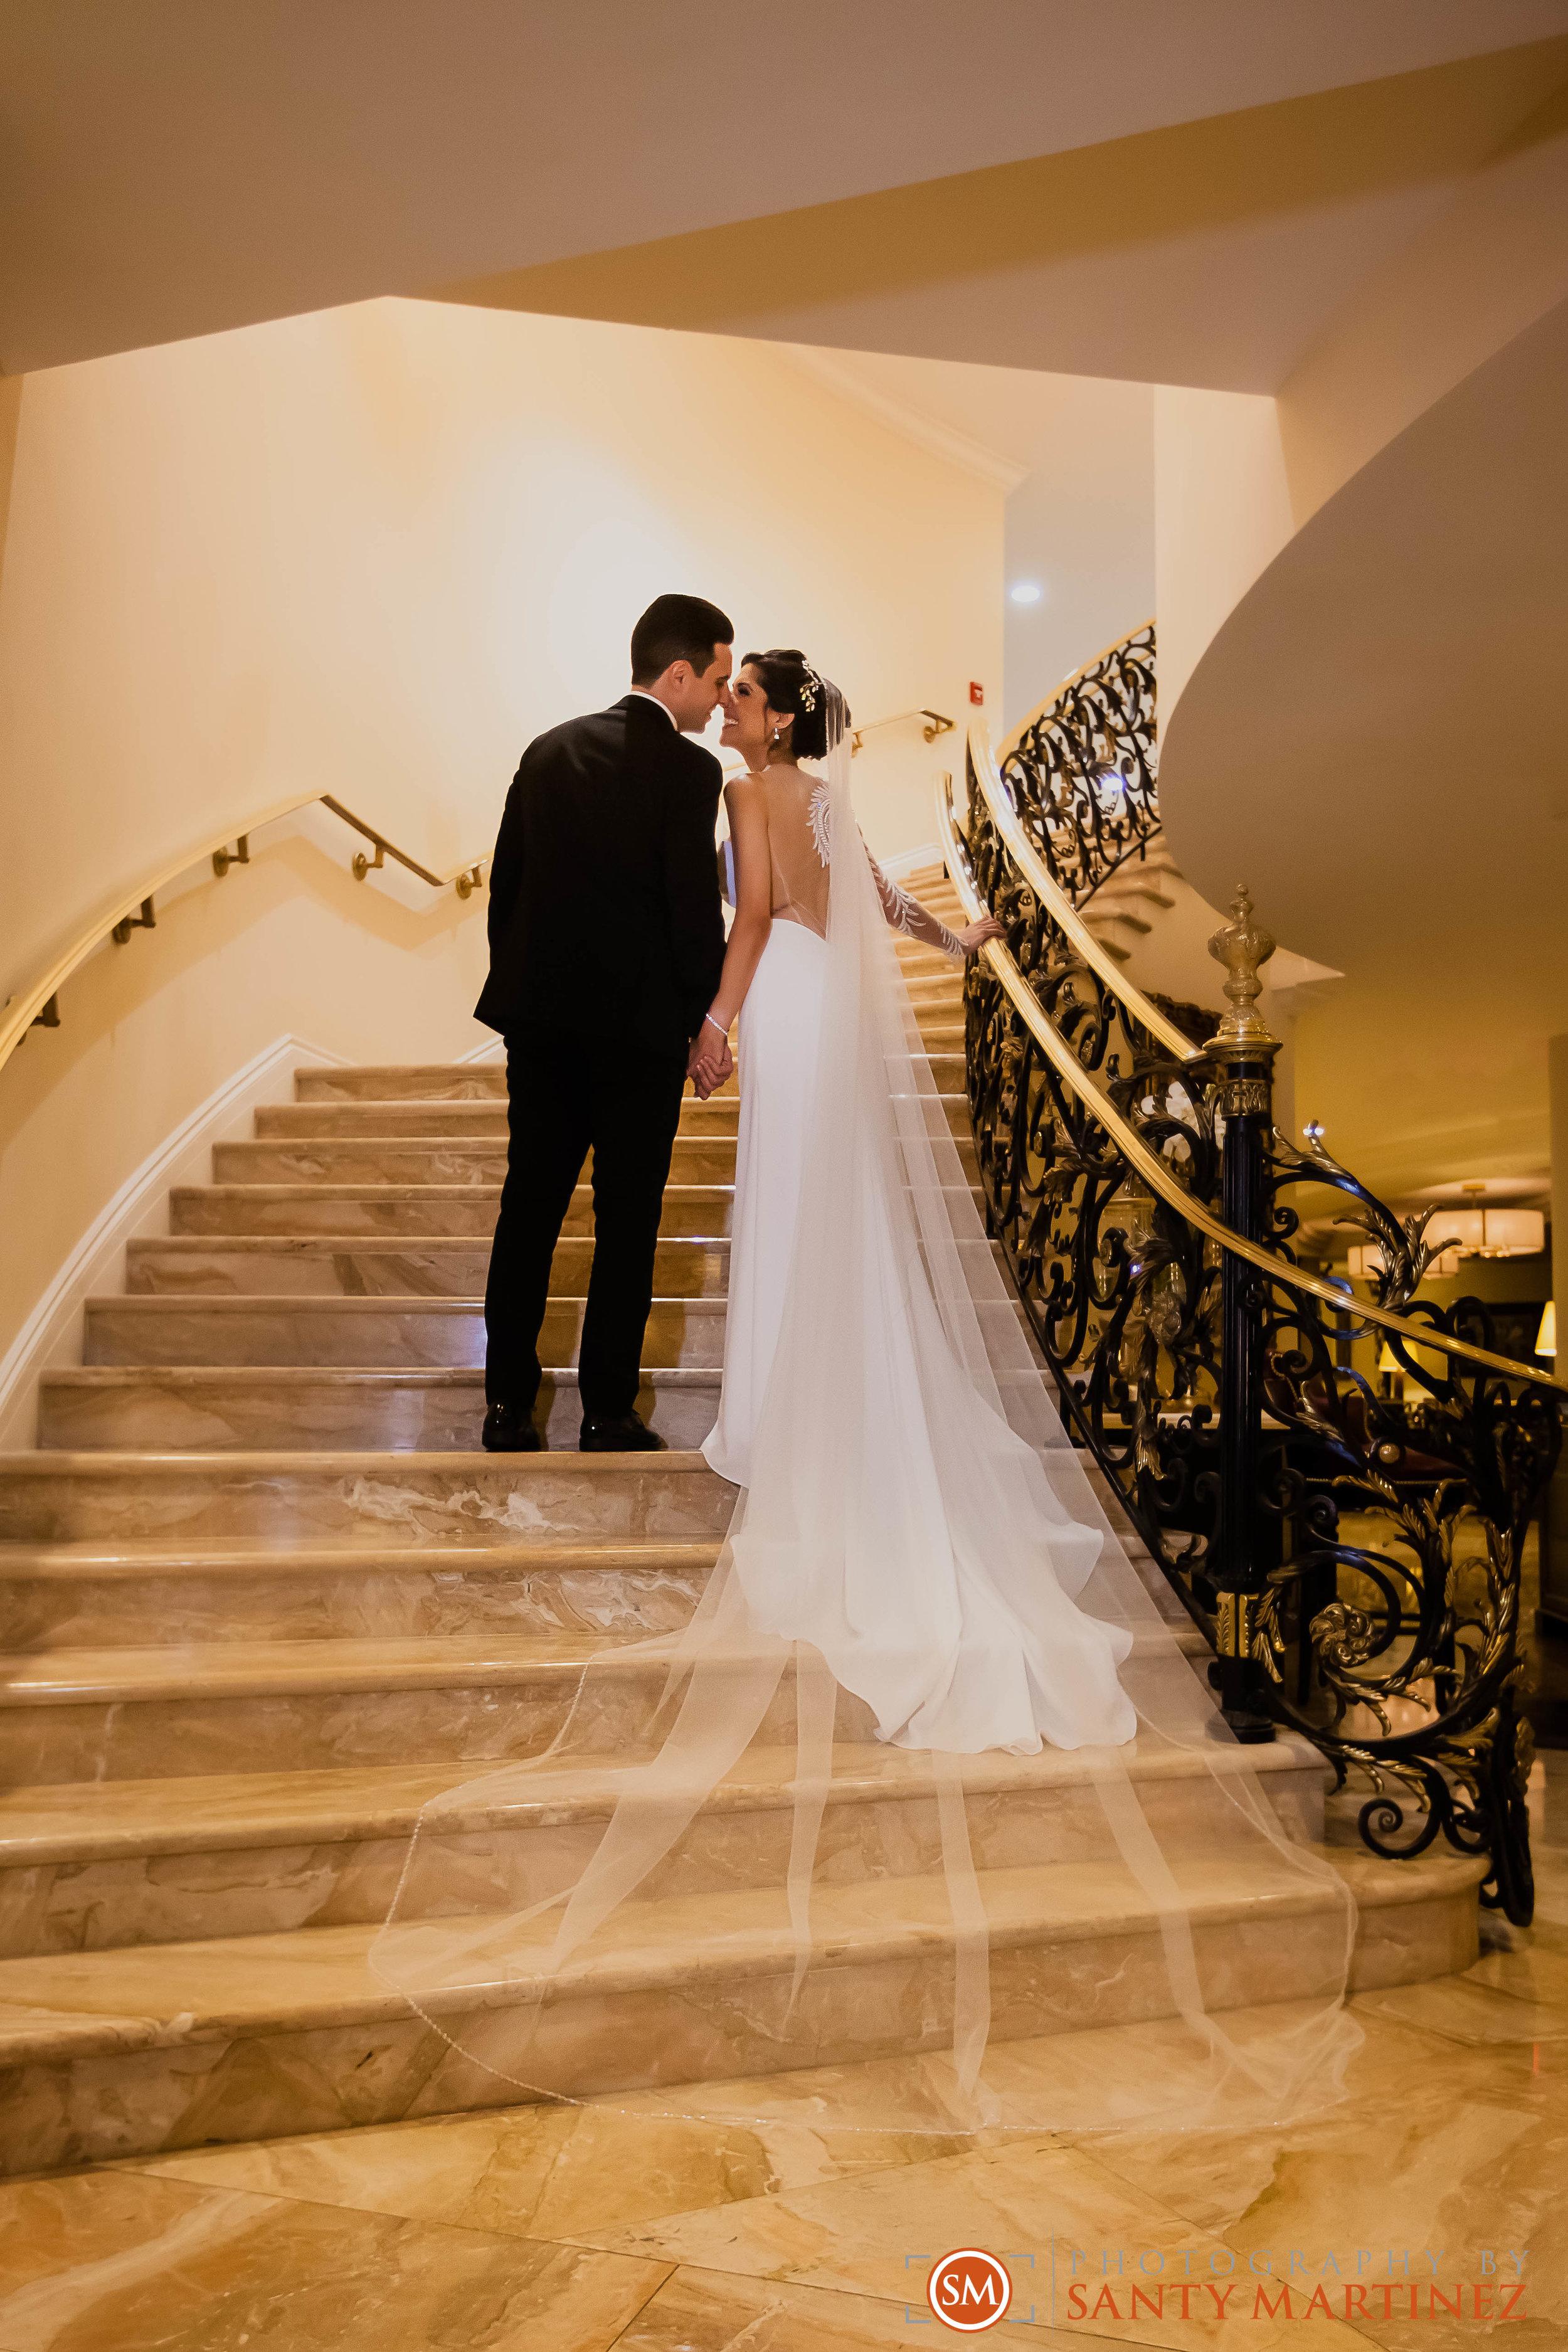 Wedding Trump National Doral Miami - Photography by Santy Martinez-22.jpg